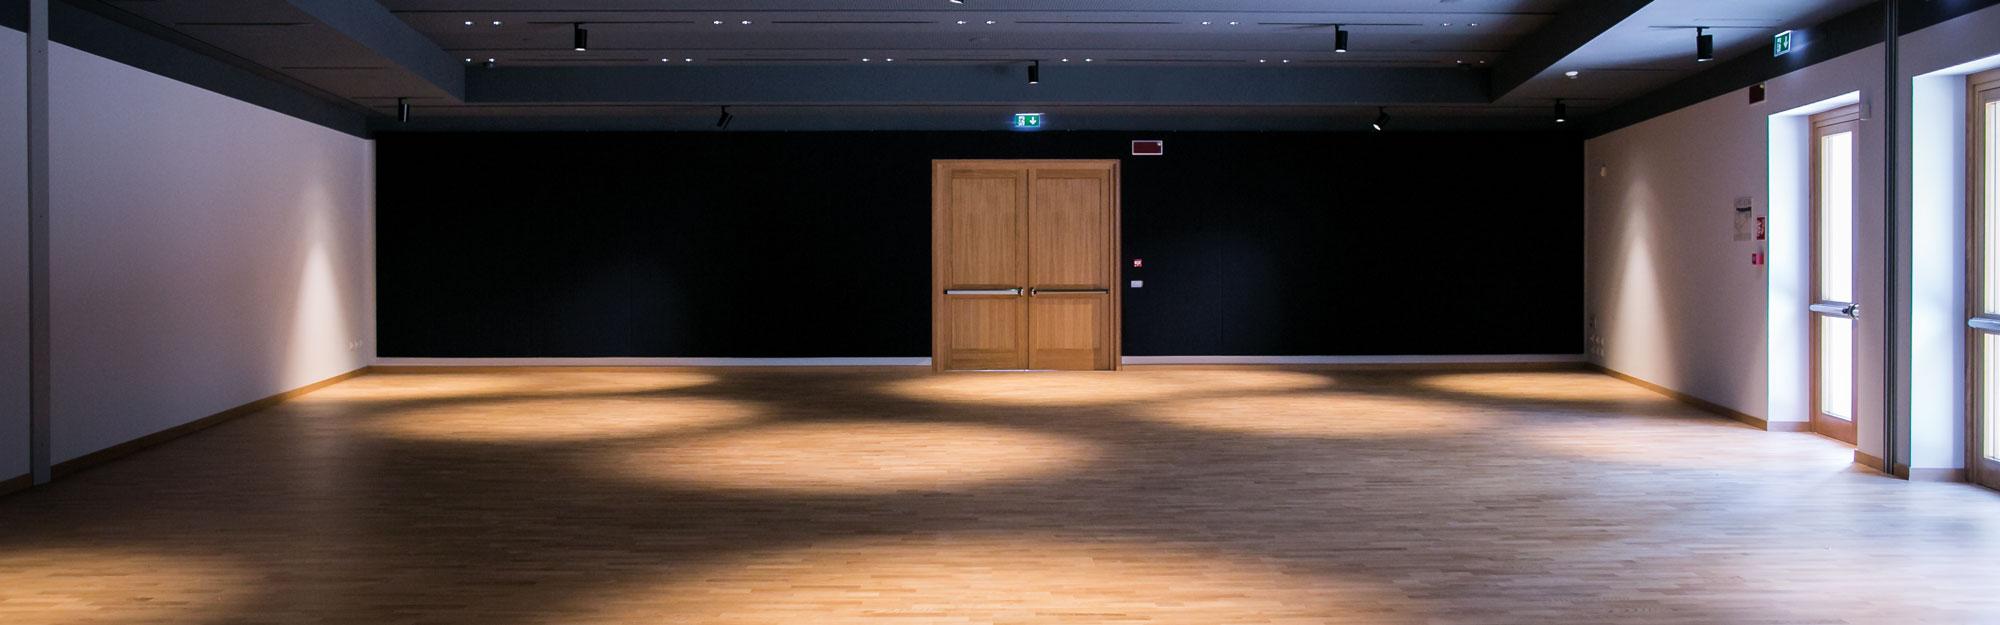 Sala Polivalente - Politeama Tolentino